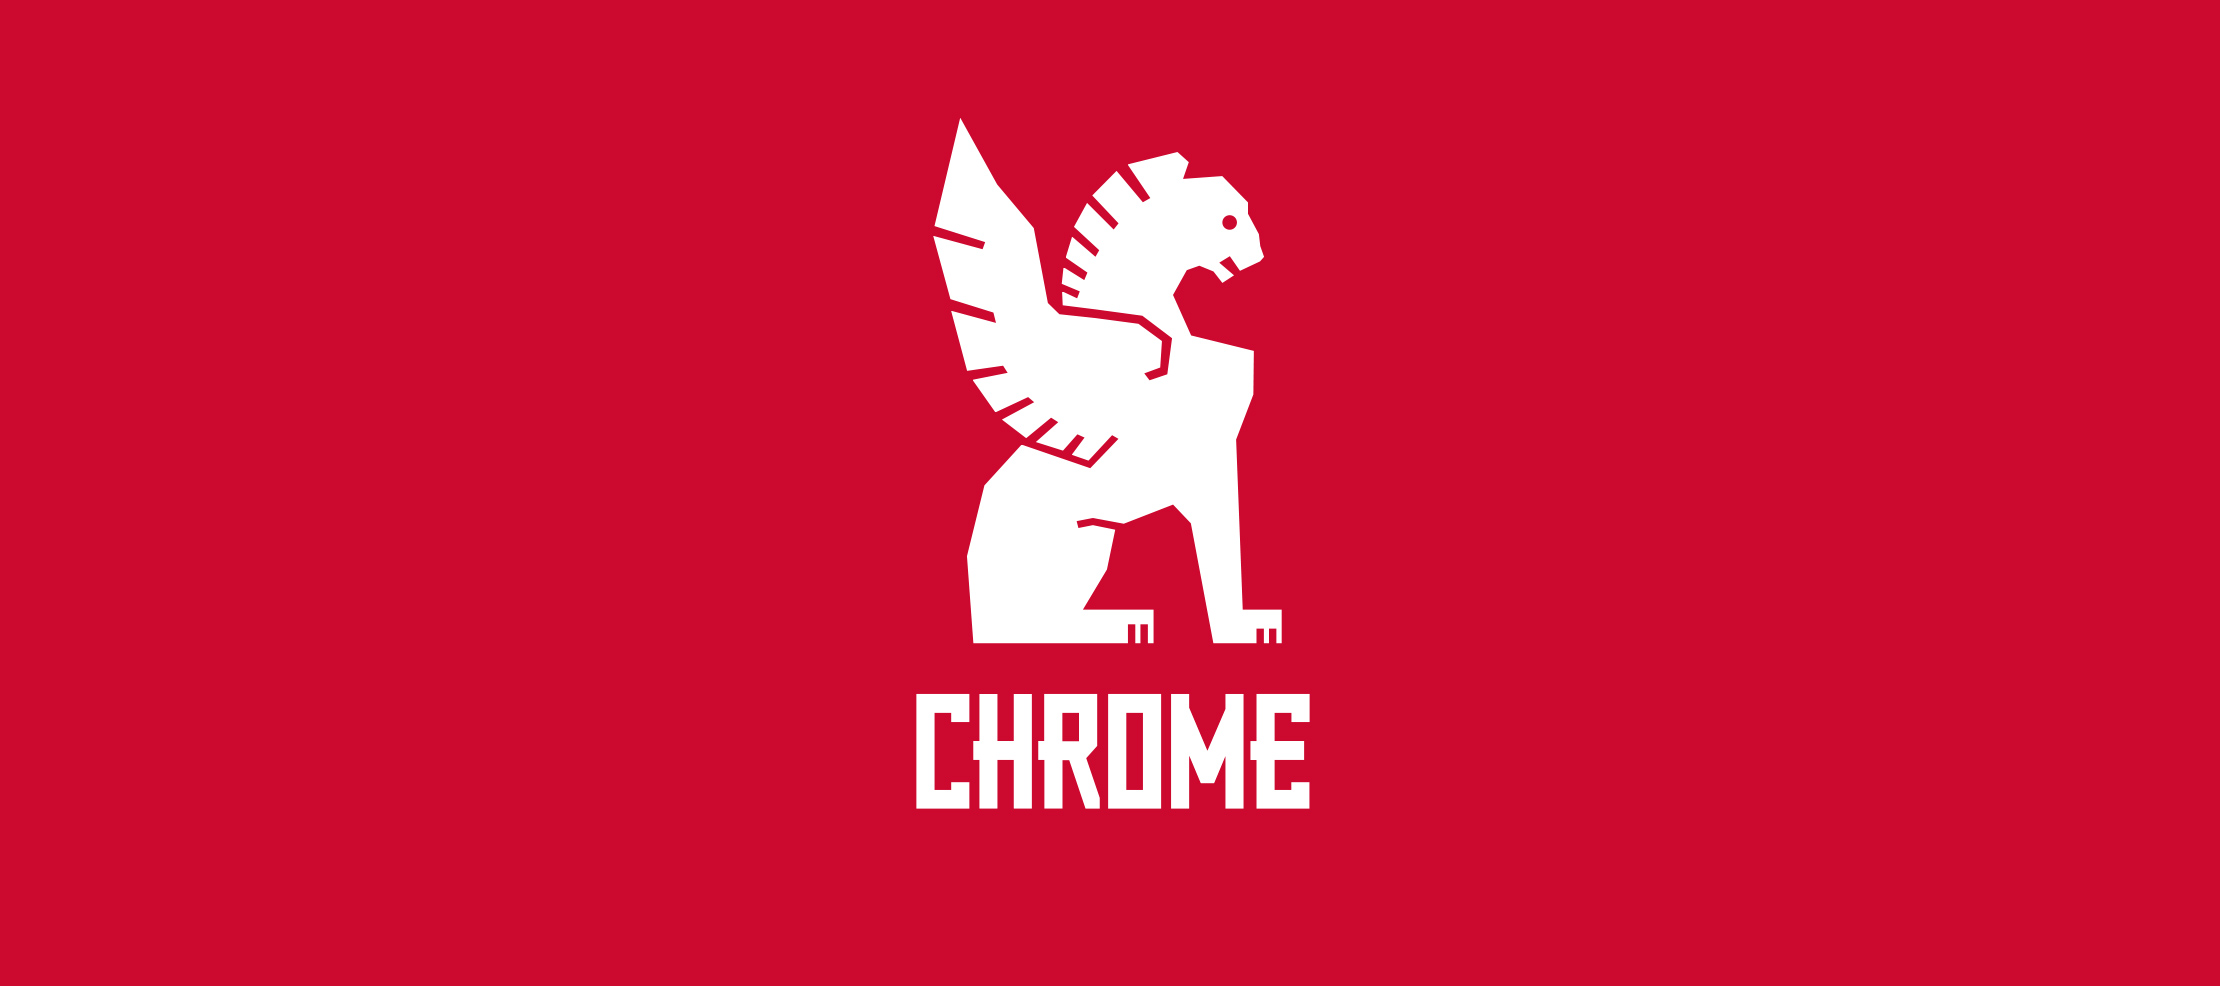 Chrome Industries Logo